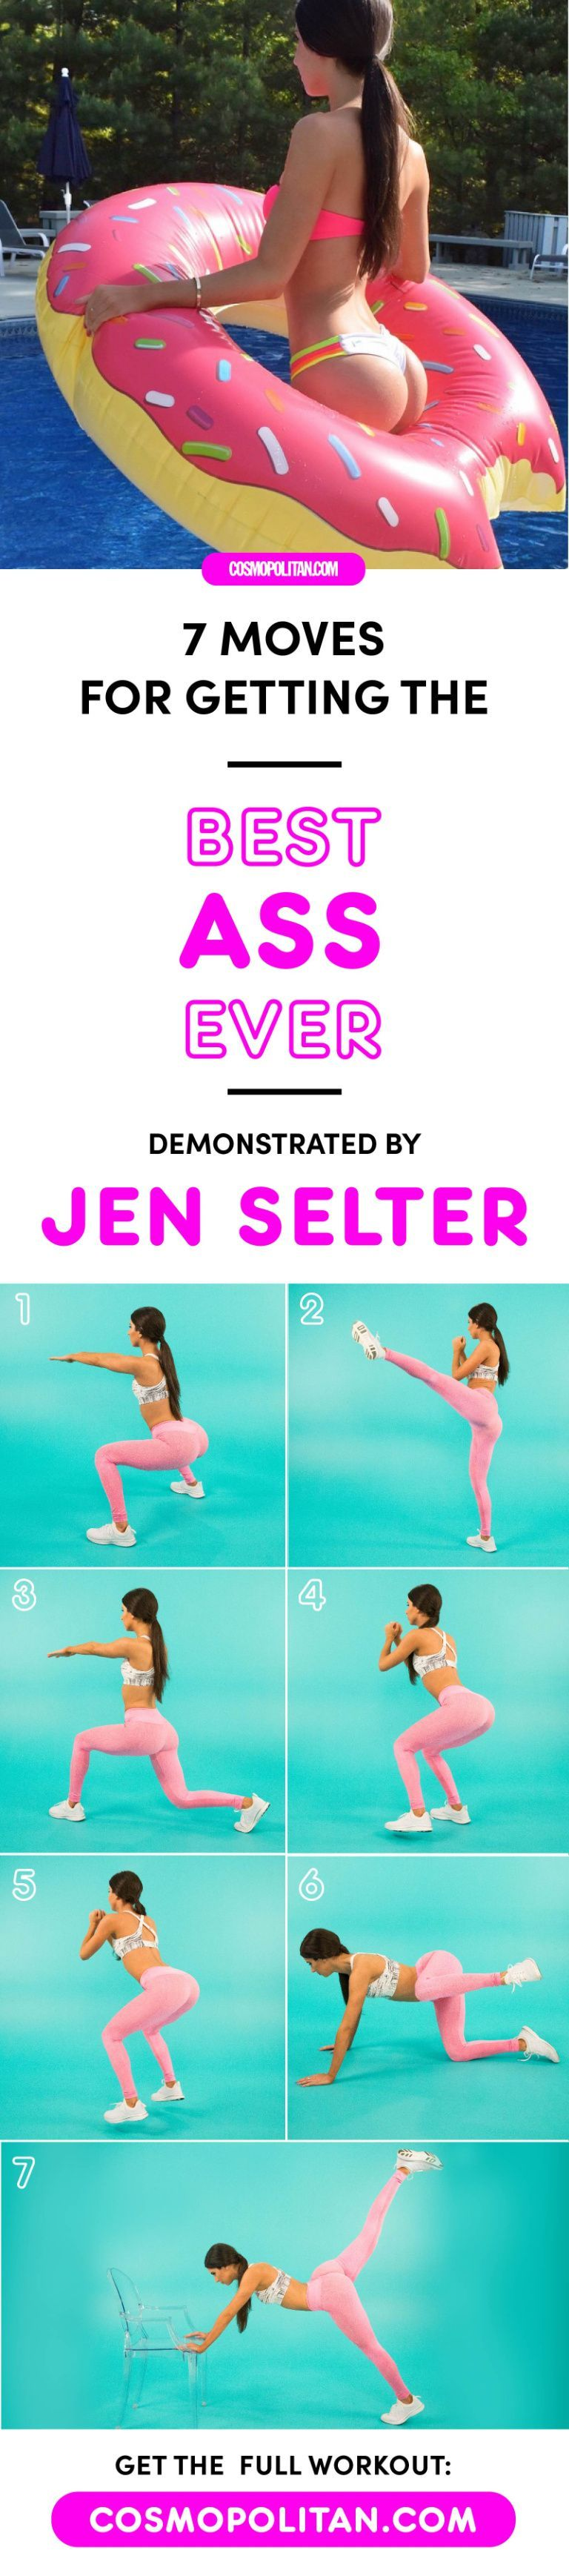 60 Hottest TwitPics Jen Selter JSeltzz [Gallery] The Lion s Den University Stuff to Buy Pinterest